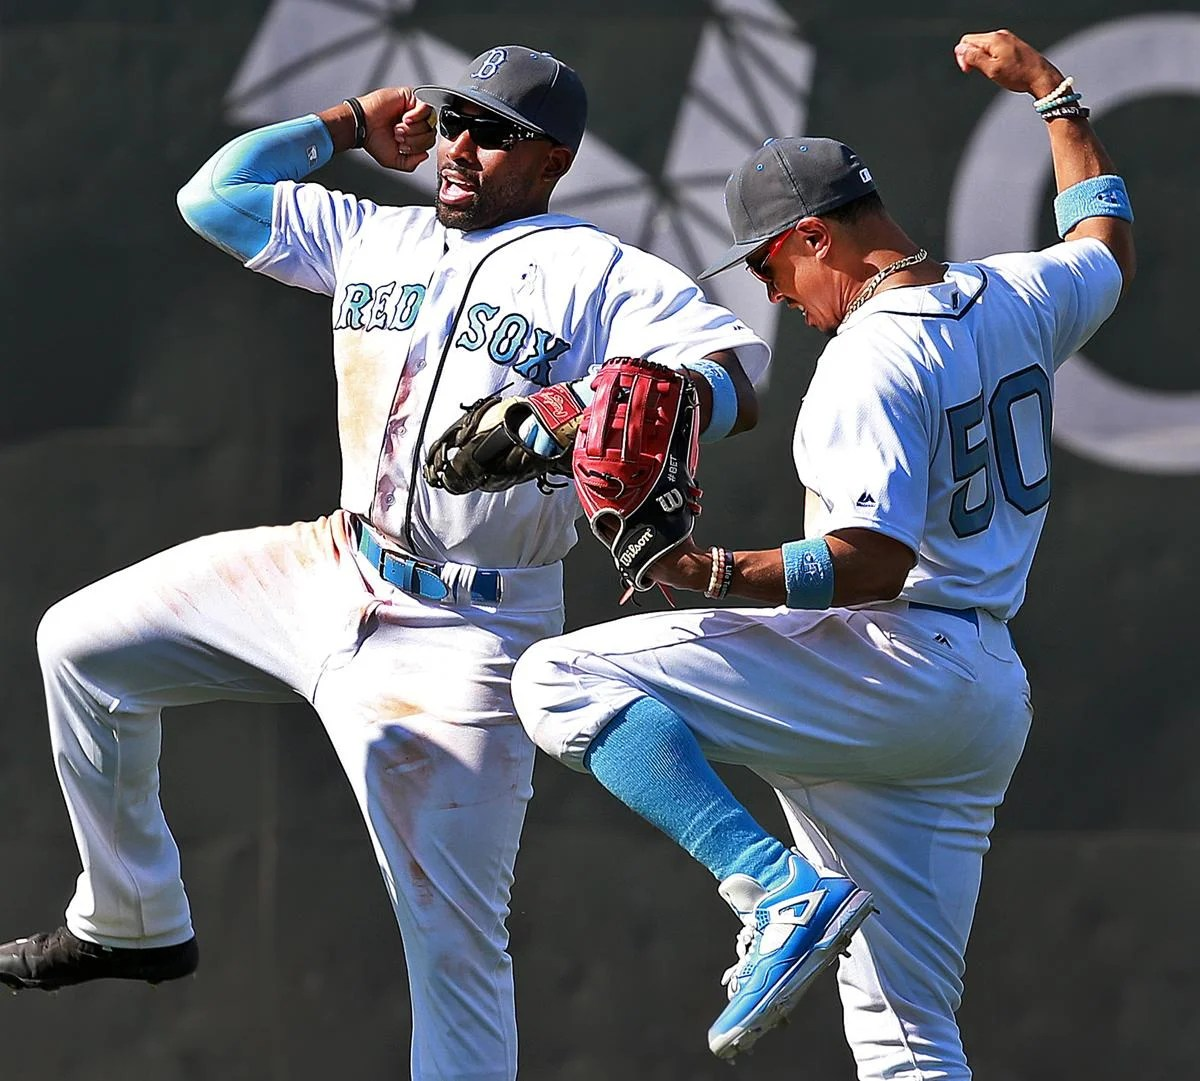 Uni Watch breaks down the 2017 slate of MLB uniforms